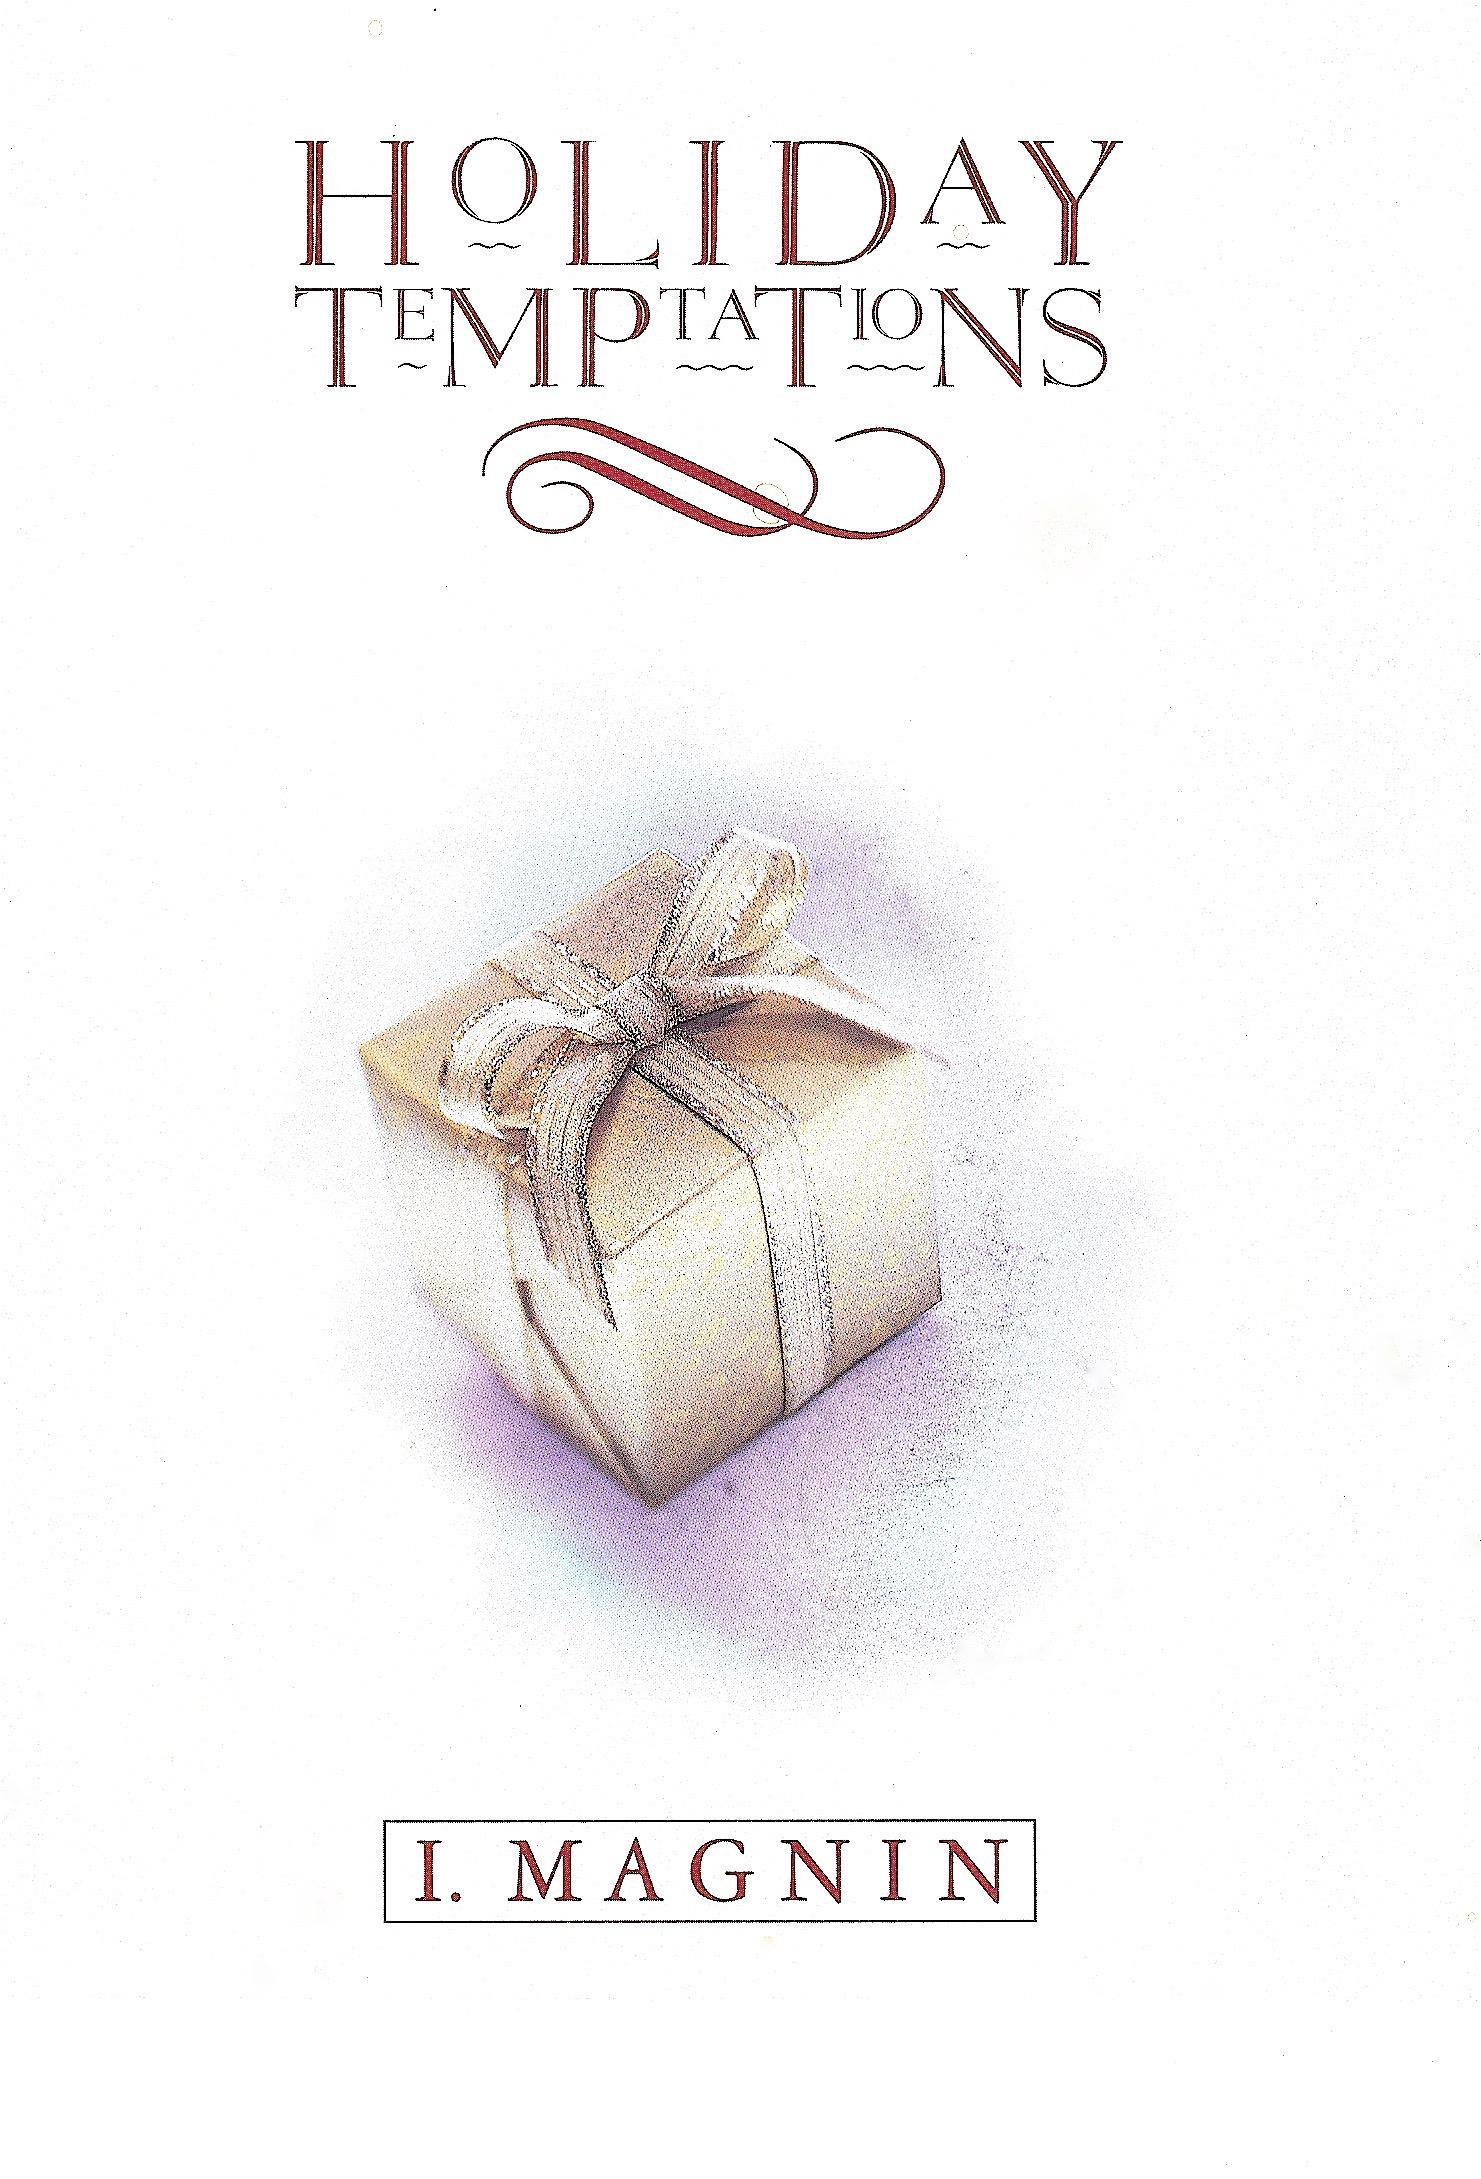 Coffin & King Press - Coffin & King Treasure Box (perfume box) featured in I. Magnin Catalogue